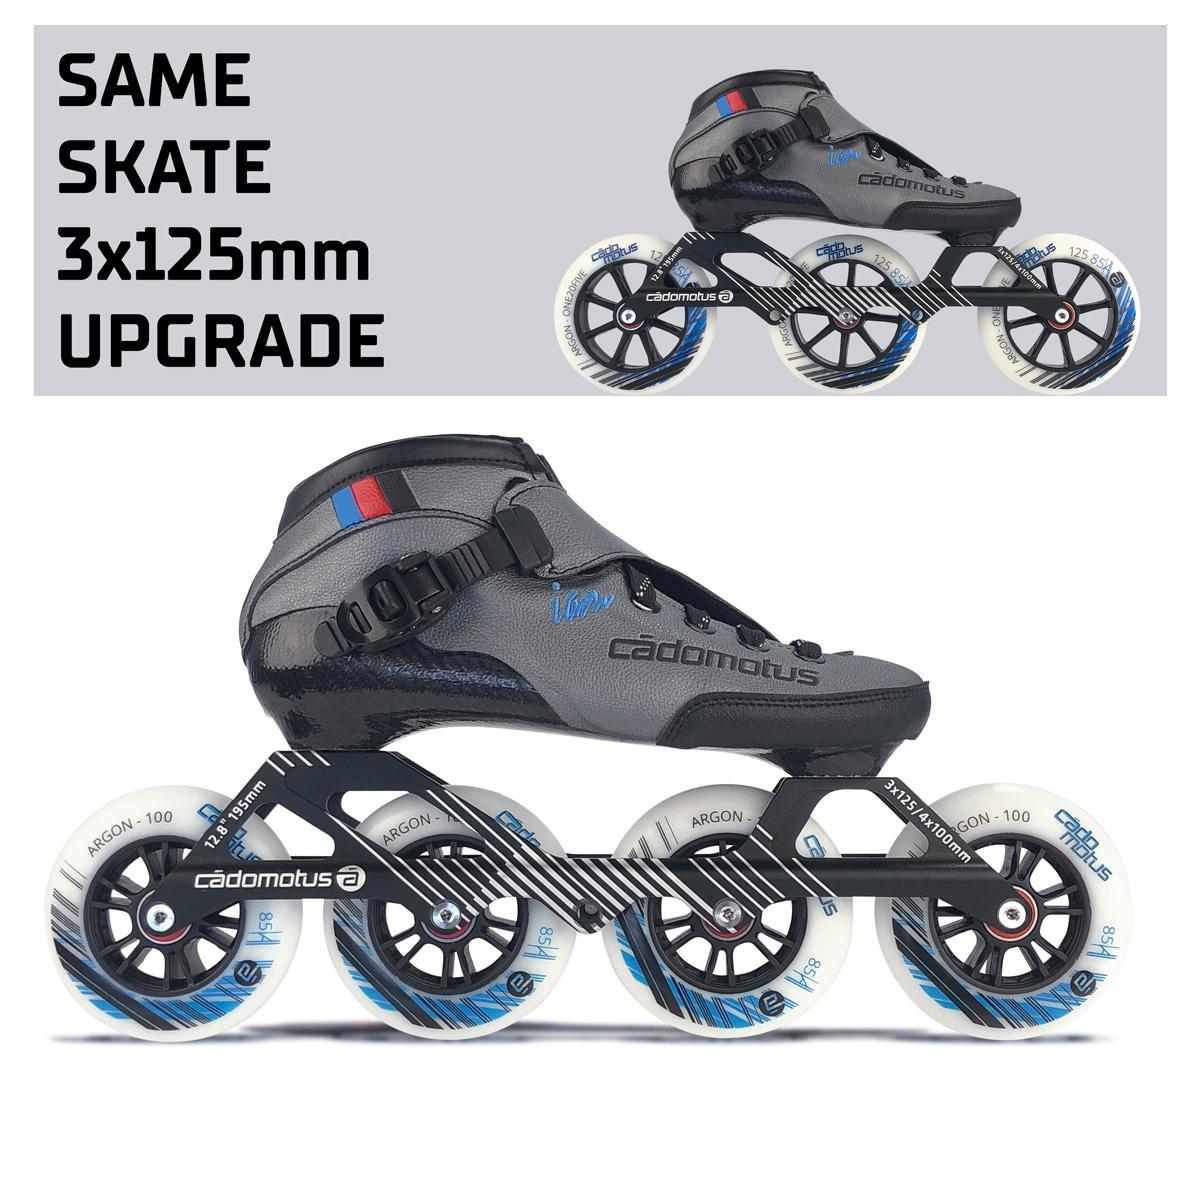 Versatile skate